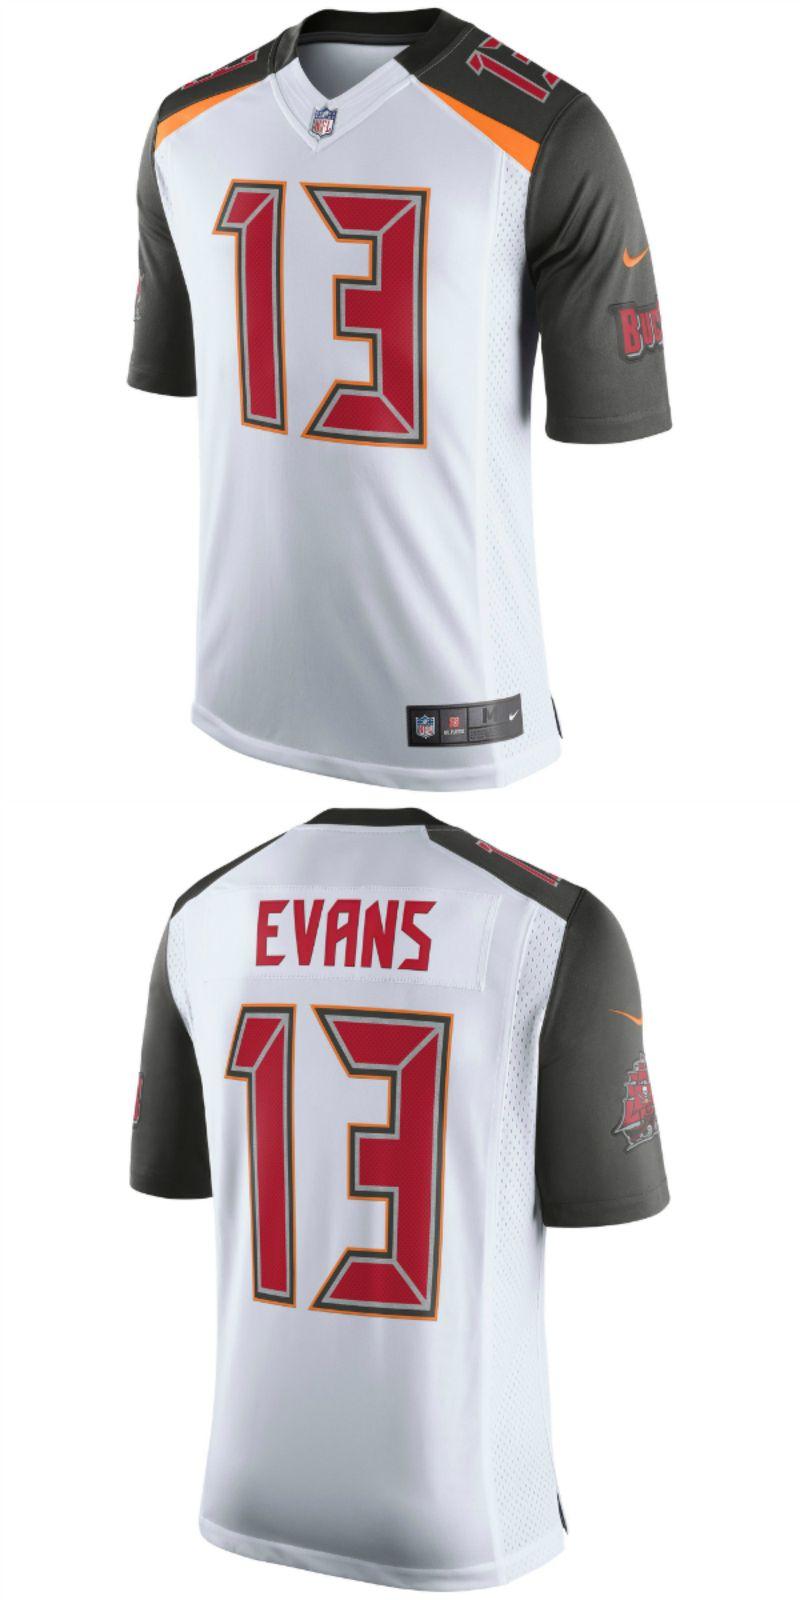 sale retailer 53a03 9aaee UP TO 70% OFF. Mike Evans Tampa Bay Buccaneers Nike Speed ...